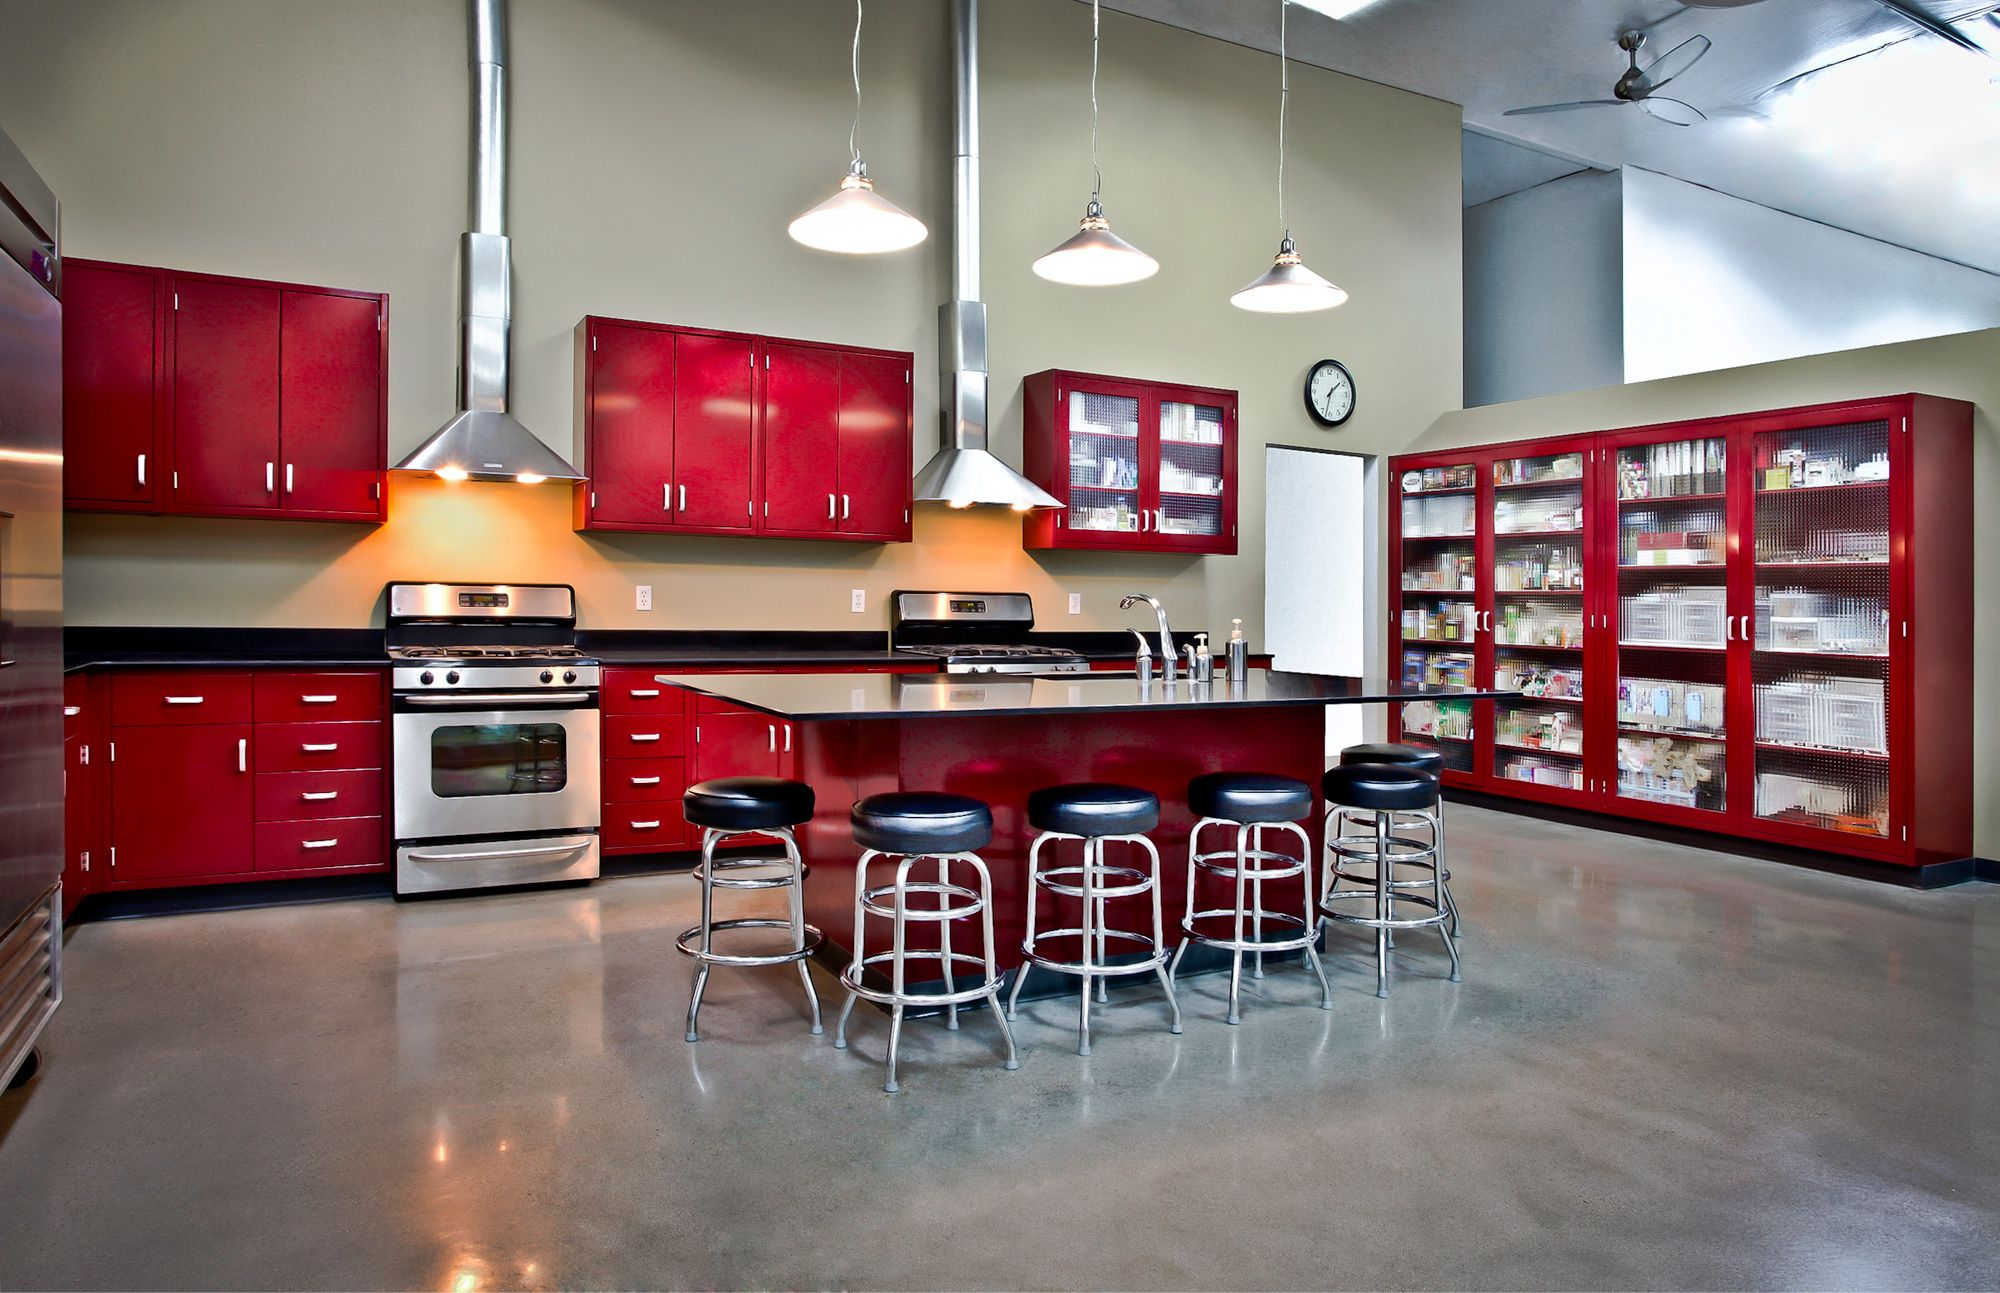 Metal Kitchen Cabinets Makeover Metal Kitchen Cabinets Kitchen Design Decor Clean Kitchen Cabinets